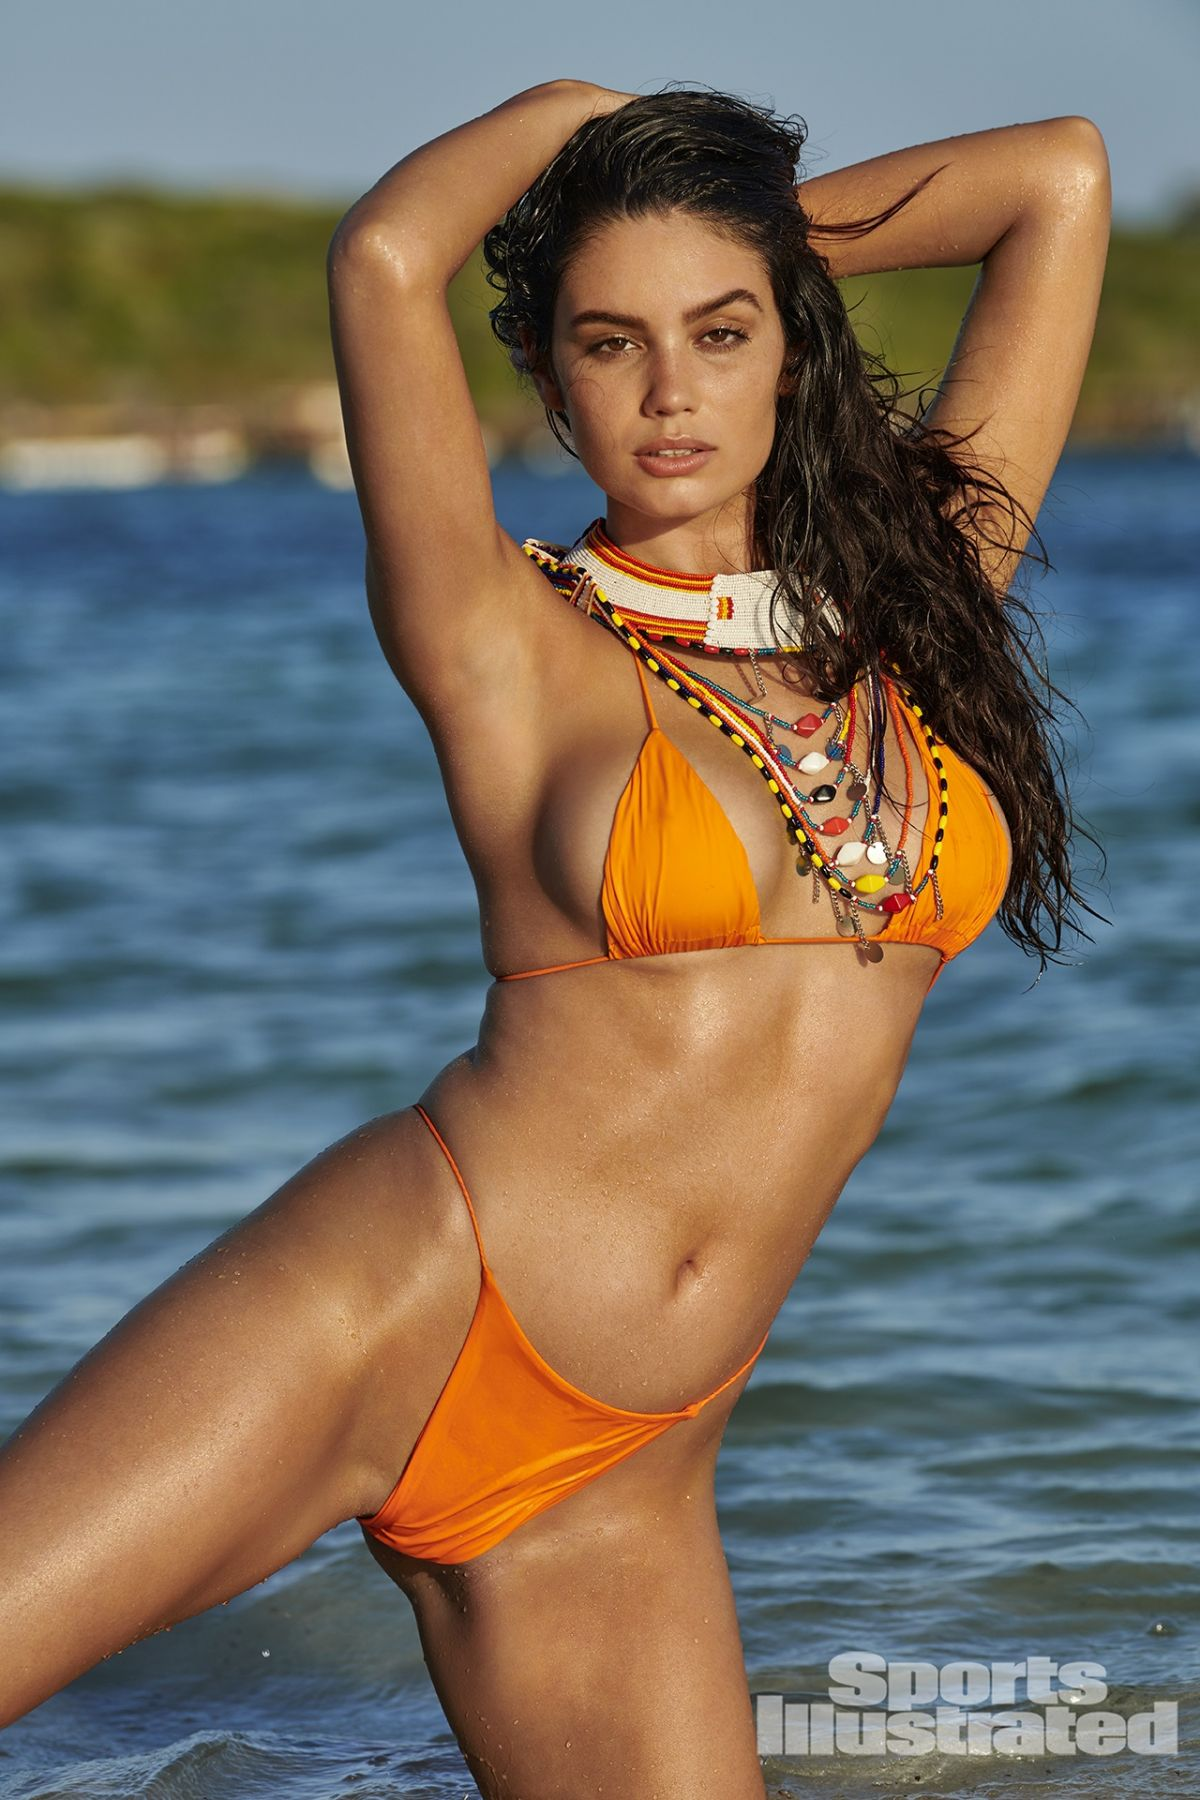 illustrated swimsuit sports paula anne si issue bikini hawtcelebs kenya tsai photographed yu celebzz gotceleb